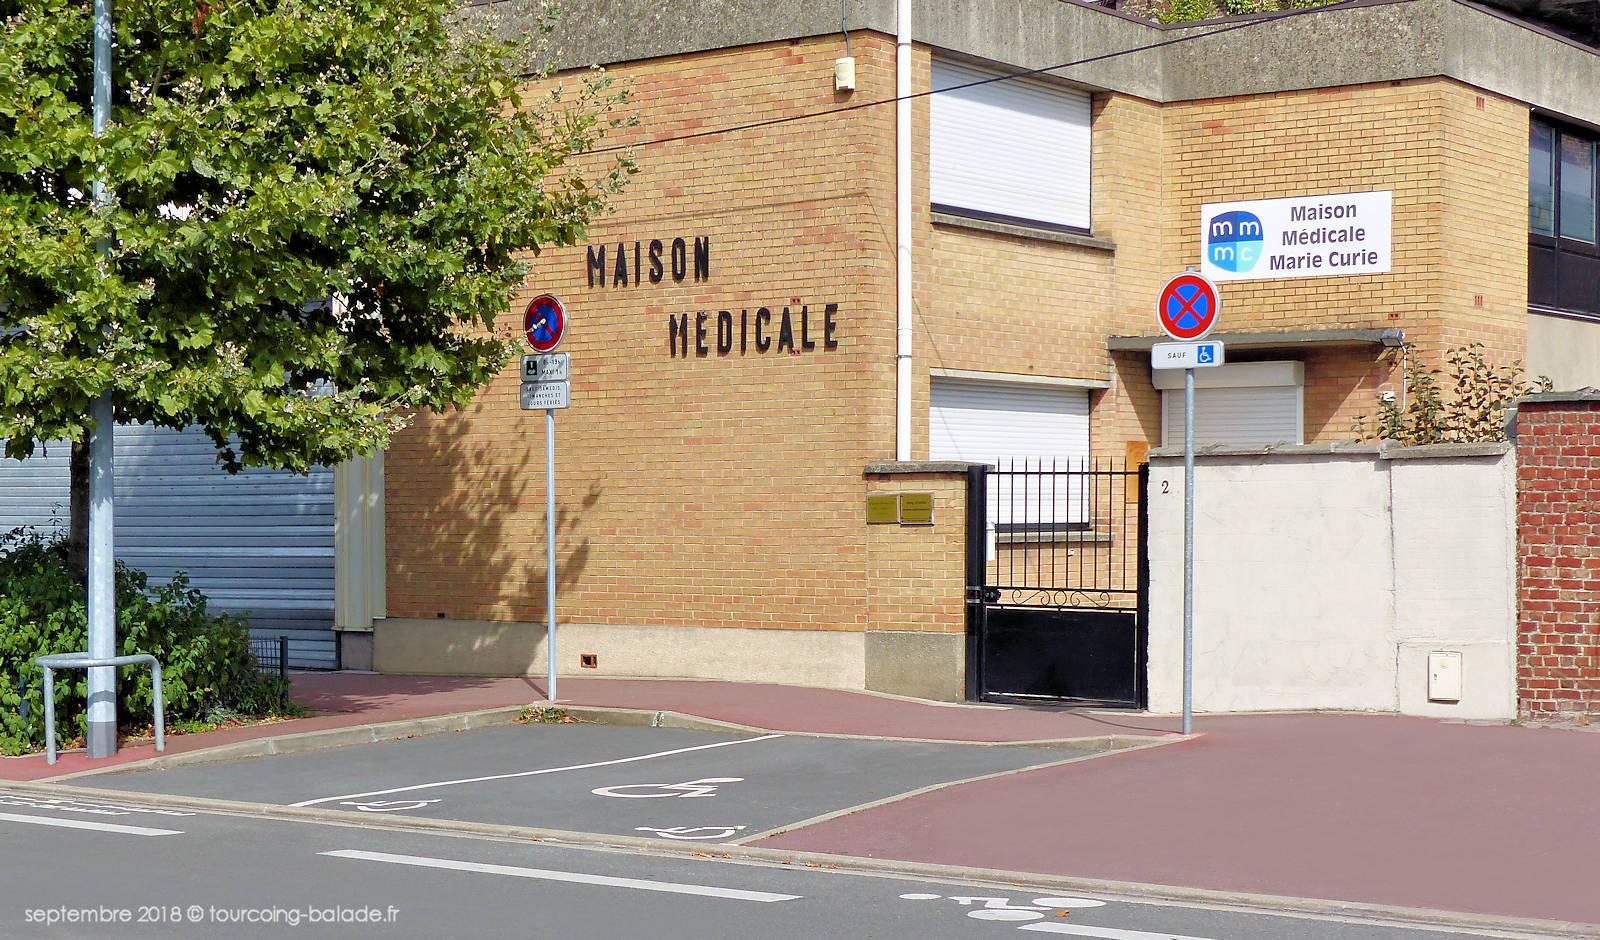 Maison Médicale Marie Curie, Tourcoing